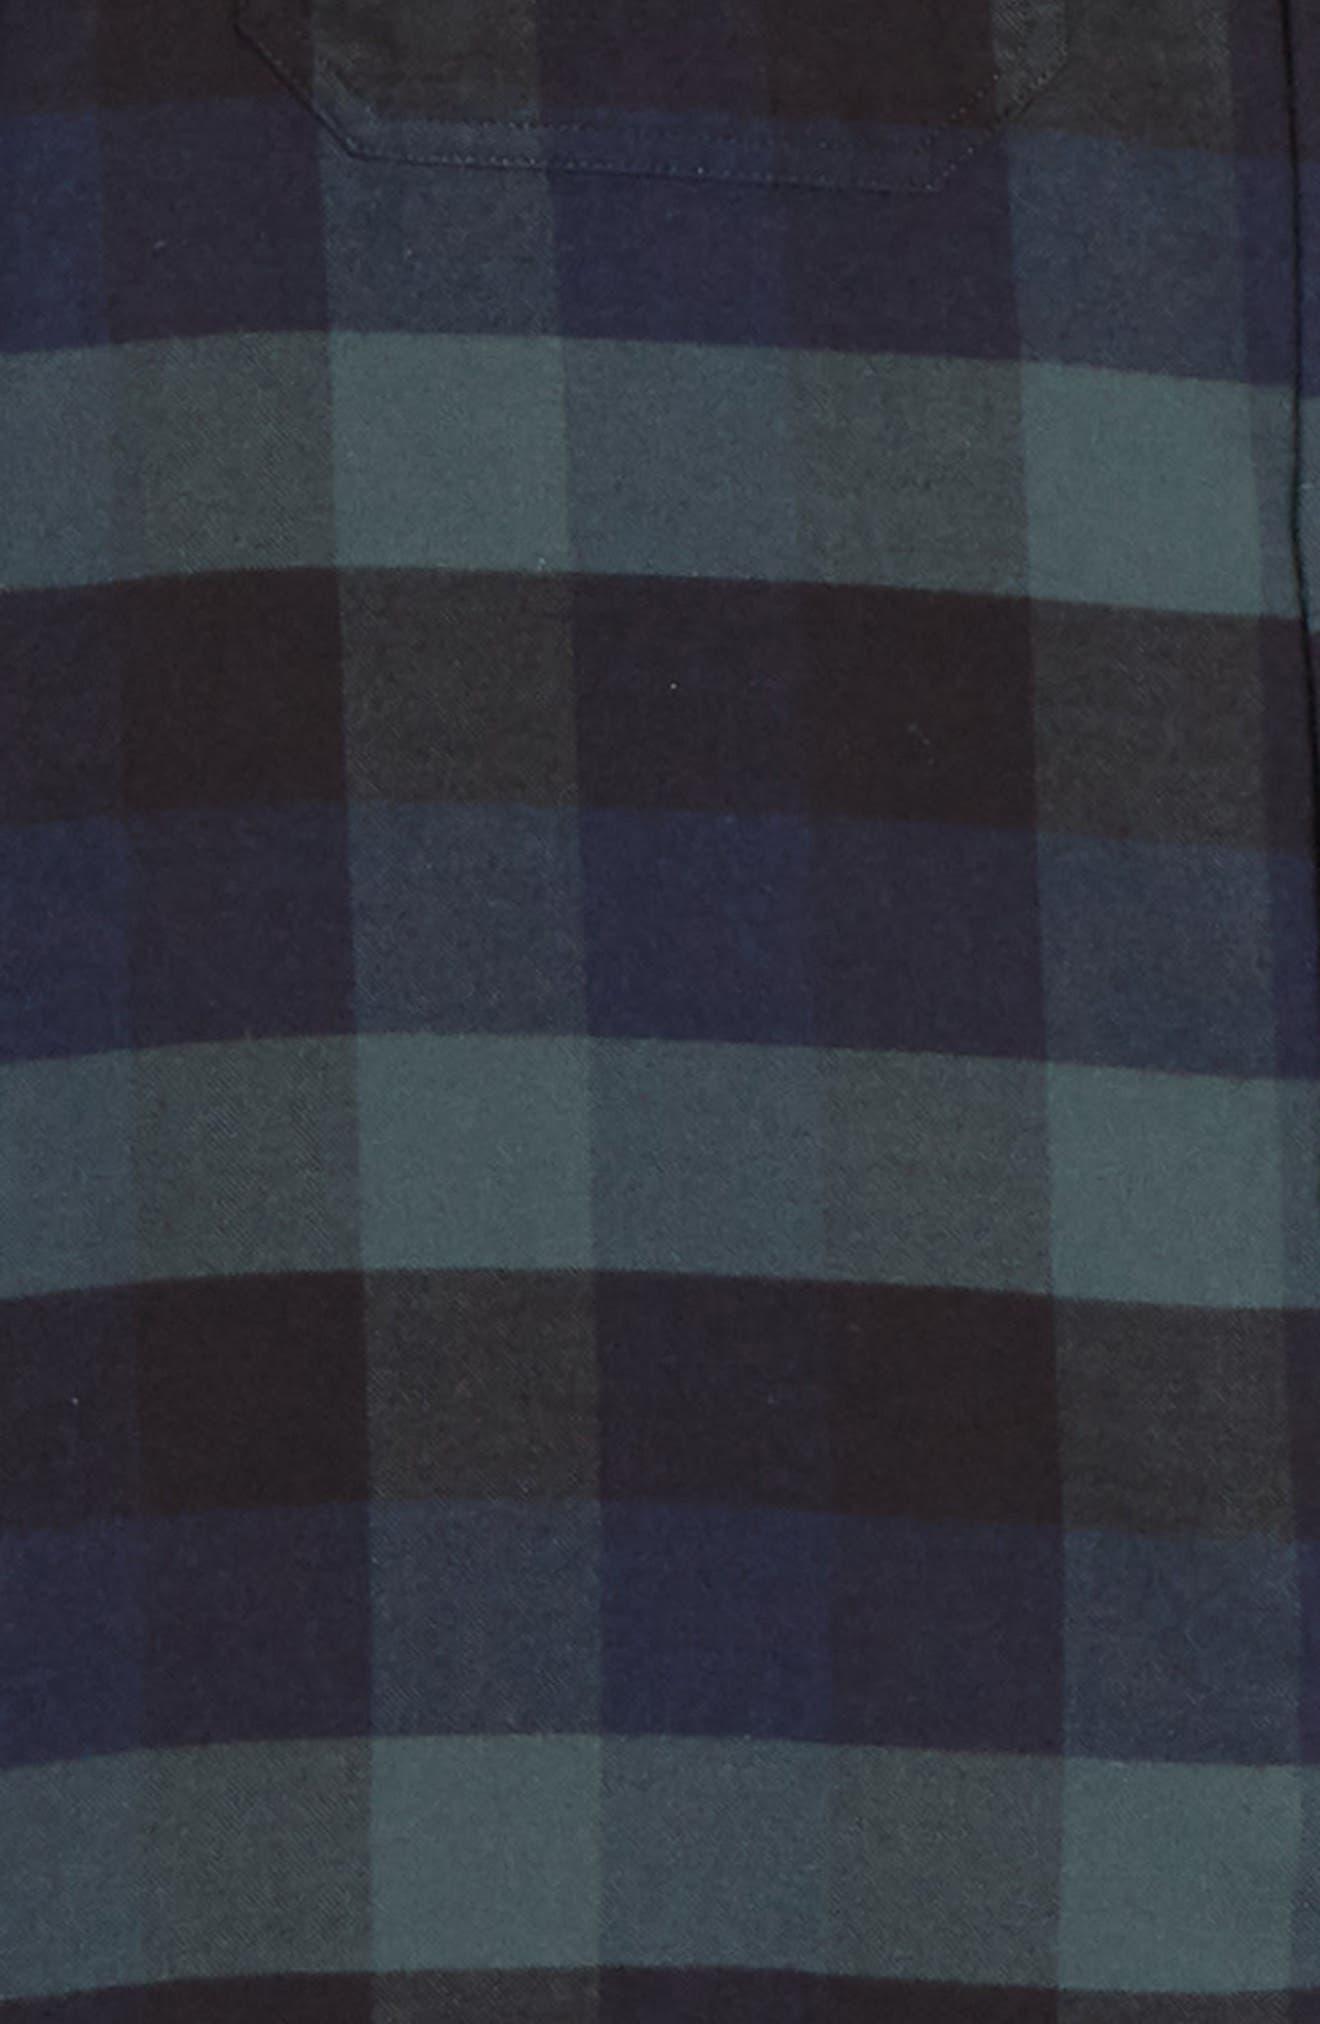 Villads Check Brushed Flannel Shirt,                             Alternate thumbnail 6, color,                             DARK NAVY